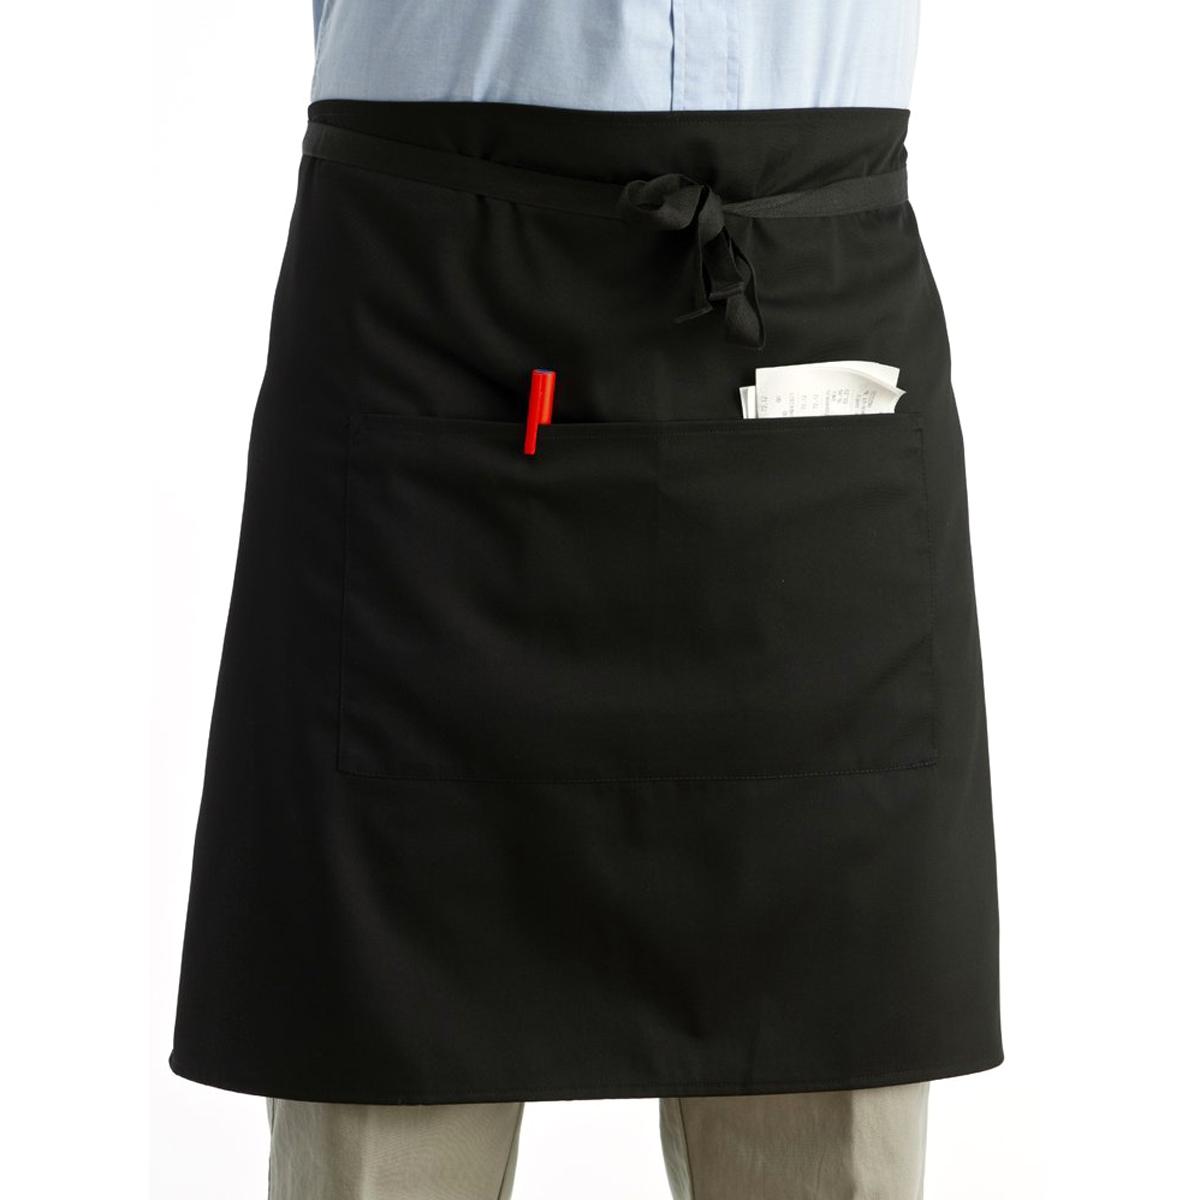 Universal Unisex Women Men Kitchen Cooking Waist Apron Short Apron Waiter Apron with Double Pockets (Black)(China (Mainland))